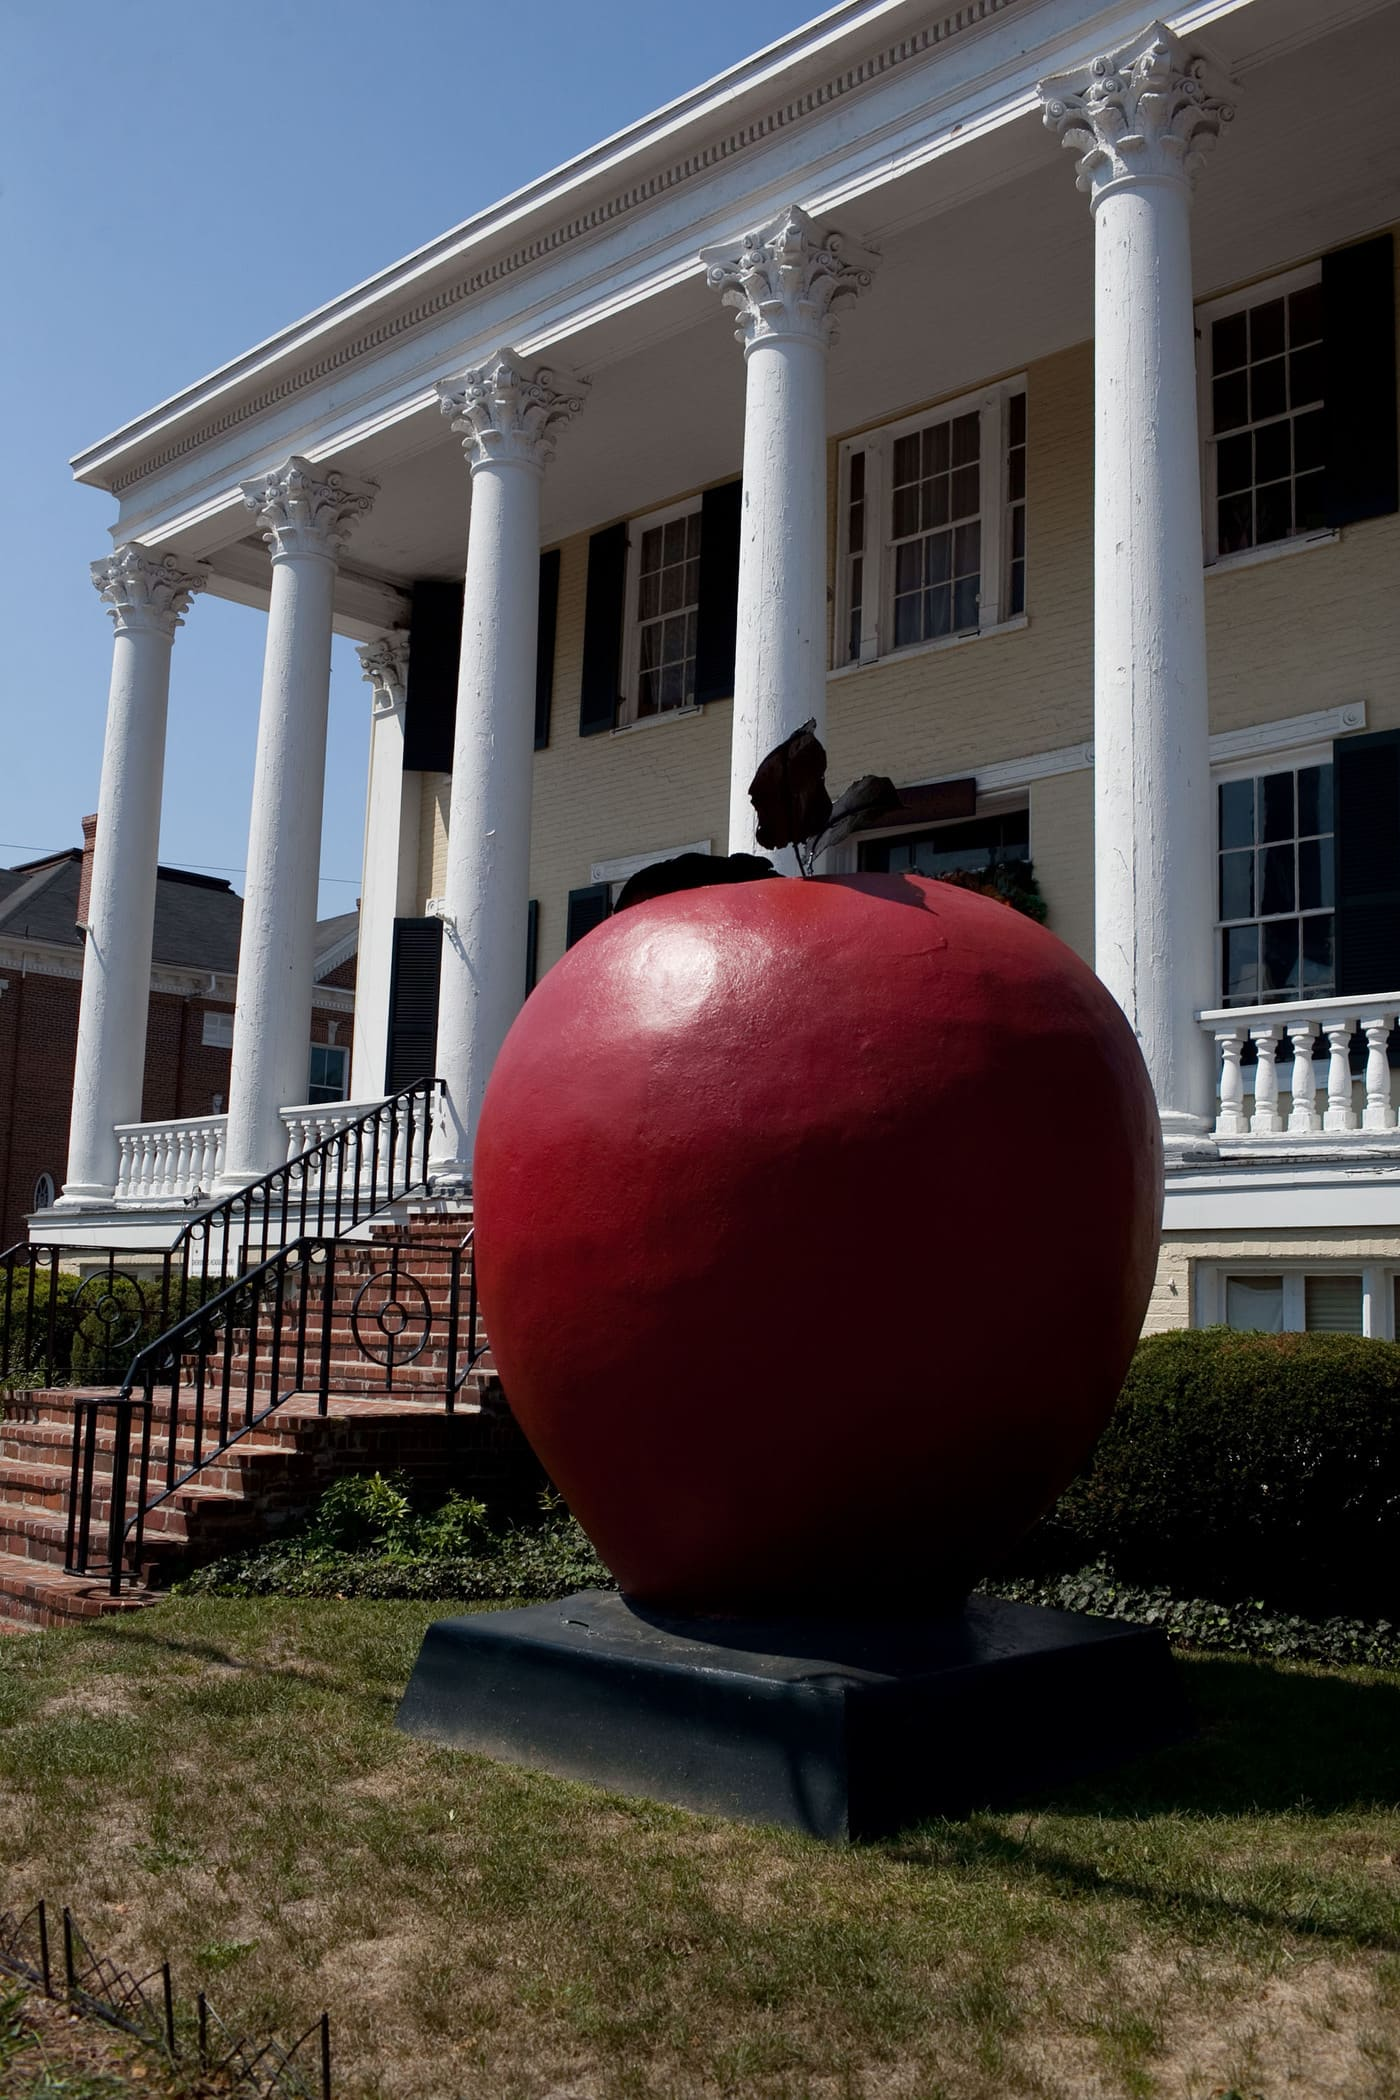 Virginia/North Carolina Road Trip - World's Largest Apple